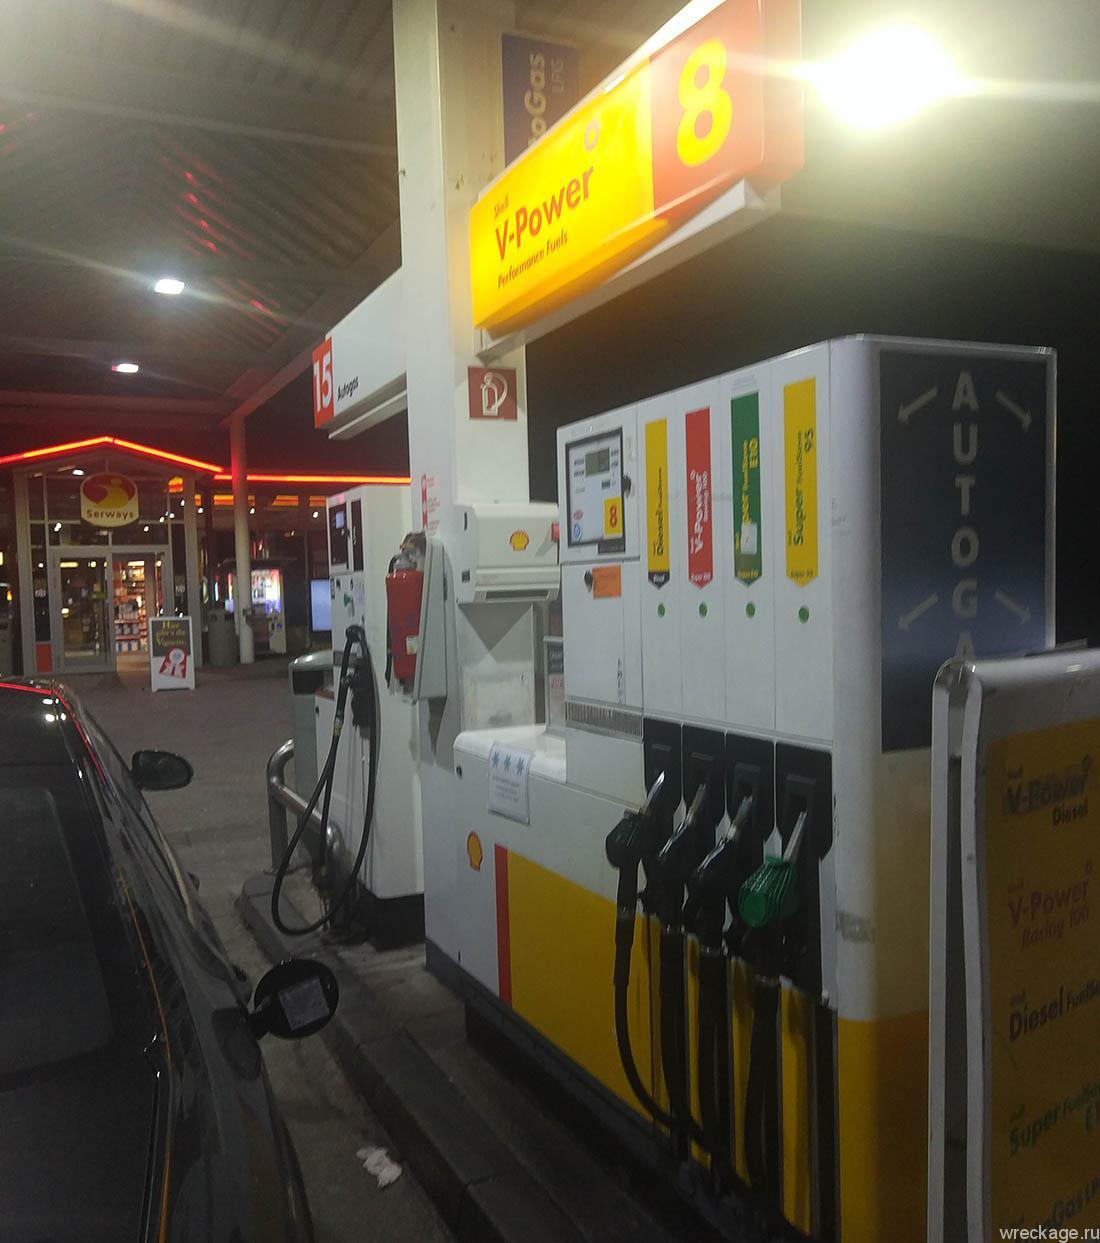 цены на бензин в австрии